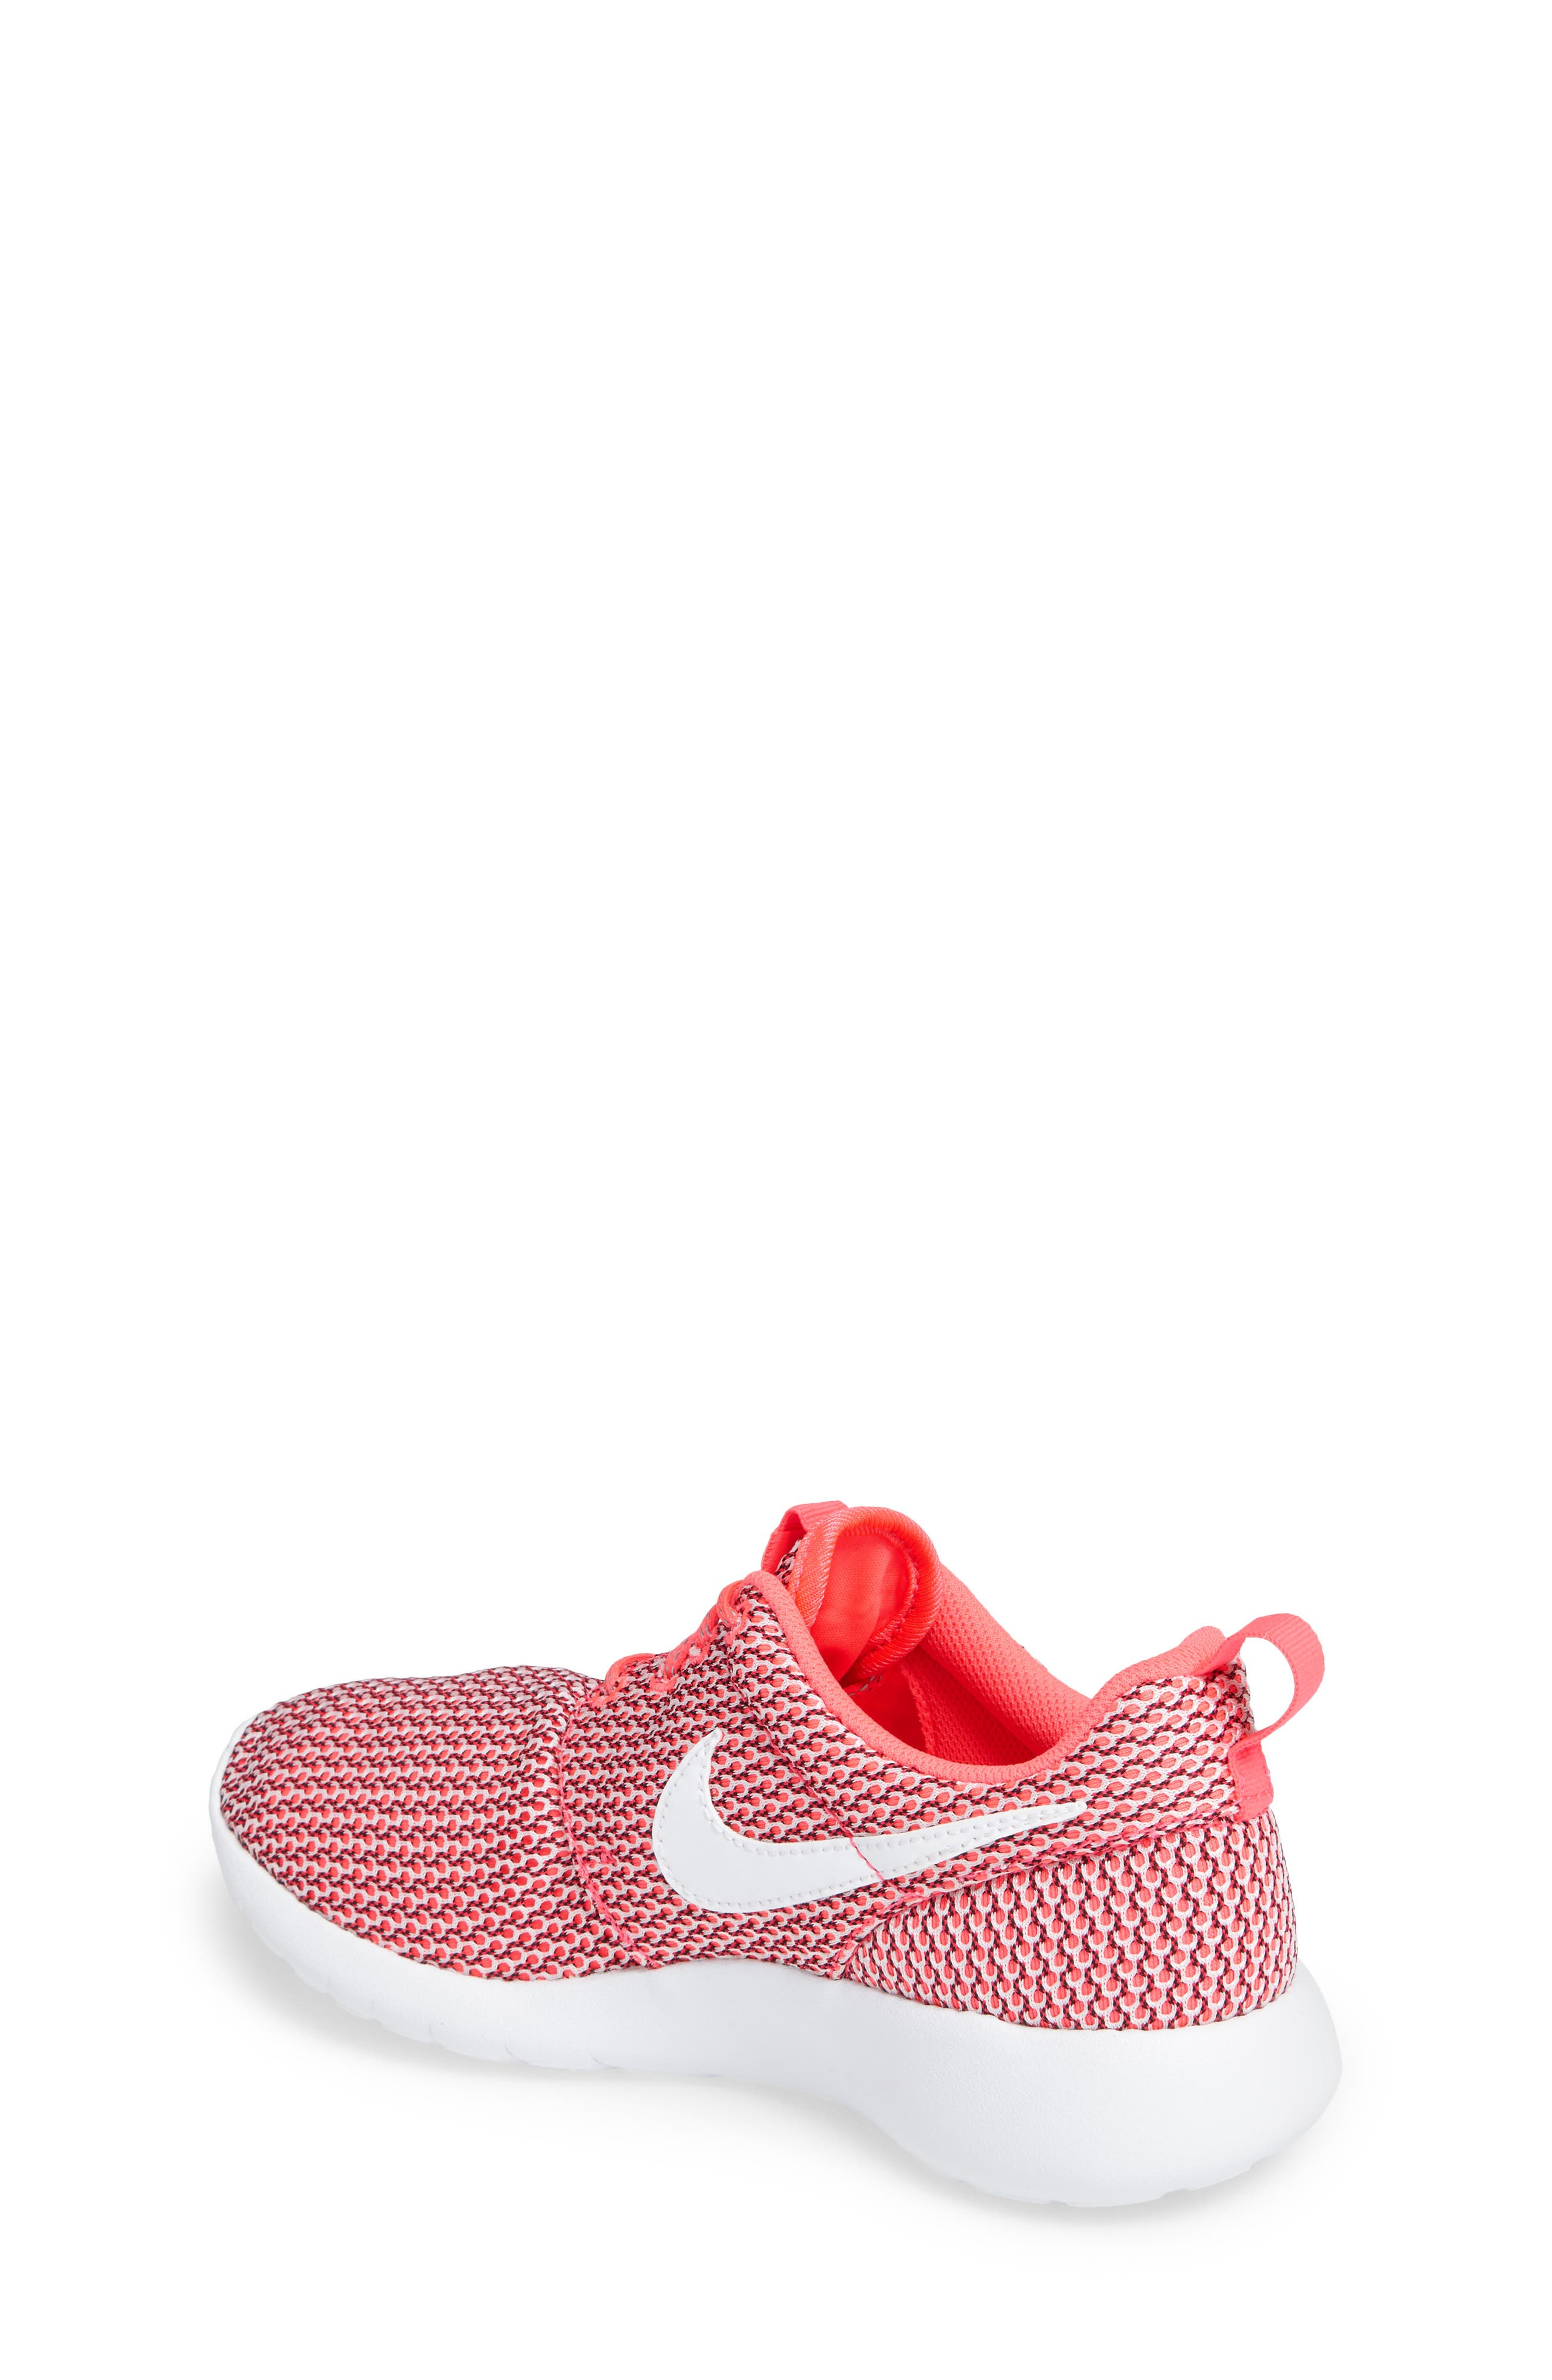 'Roshe Run' Athletic Shoe,                             Alternate thumbnail 105, color,